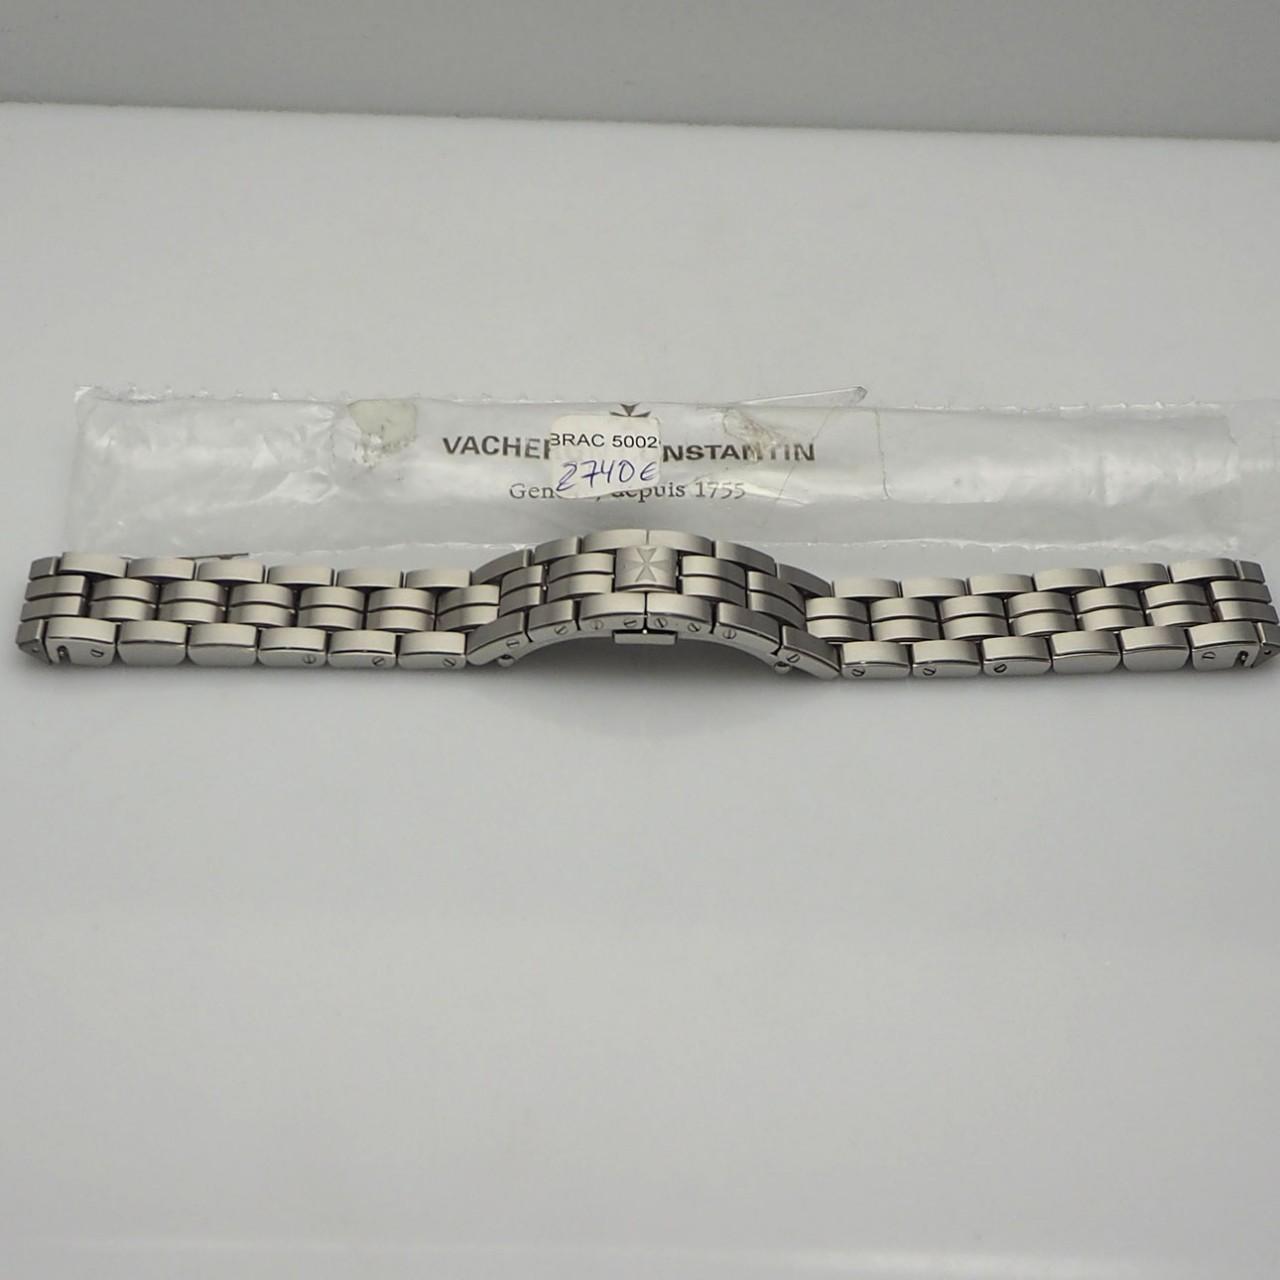 Vacheron Constantin Royal Eagle Stahlband, Faltschließe 19mm